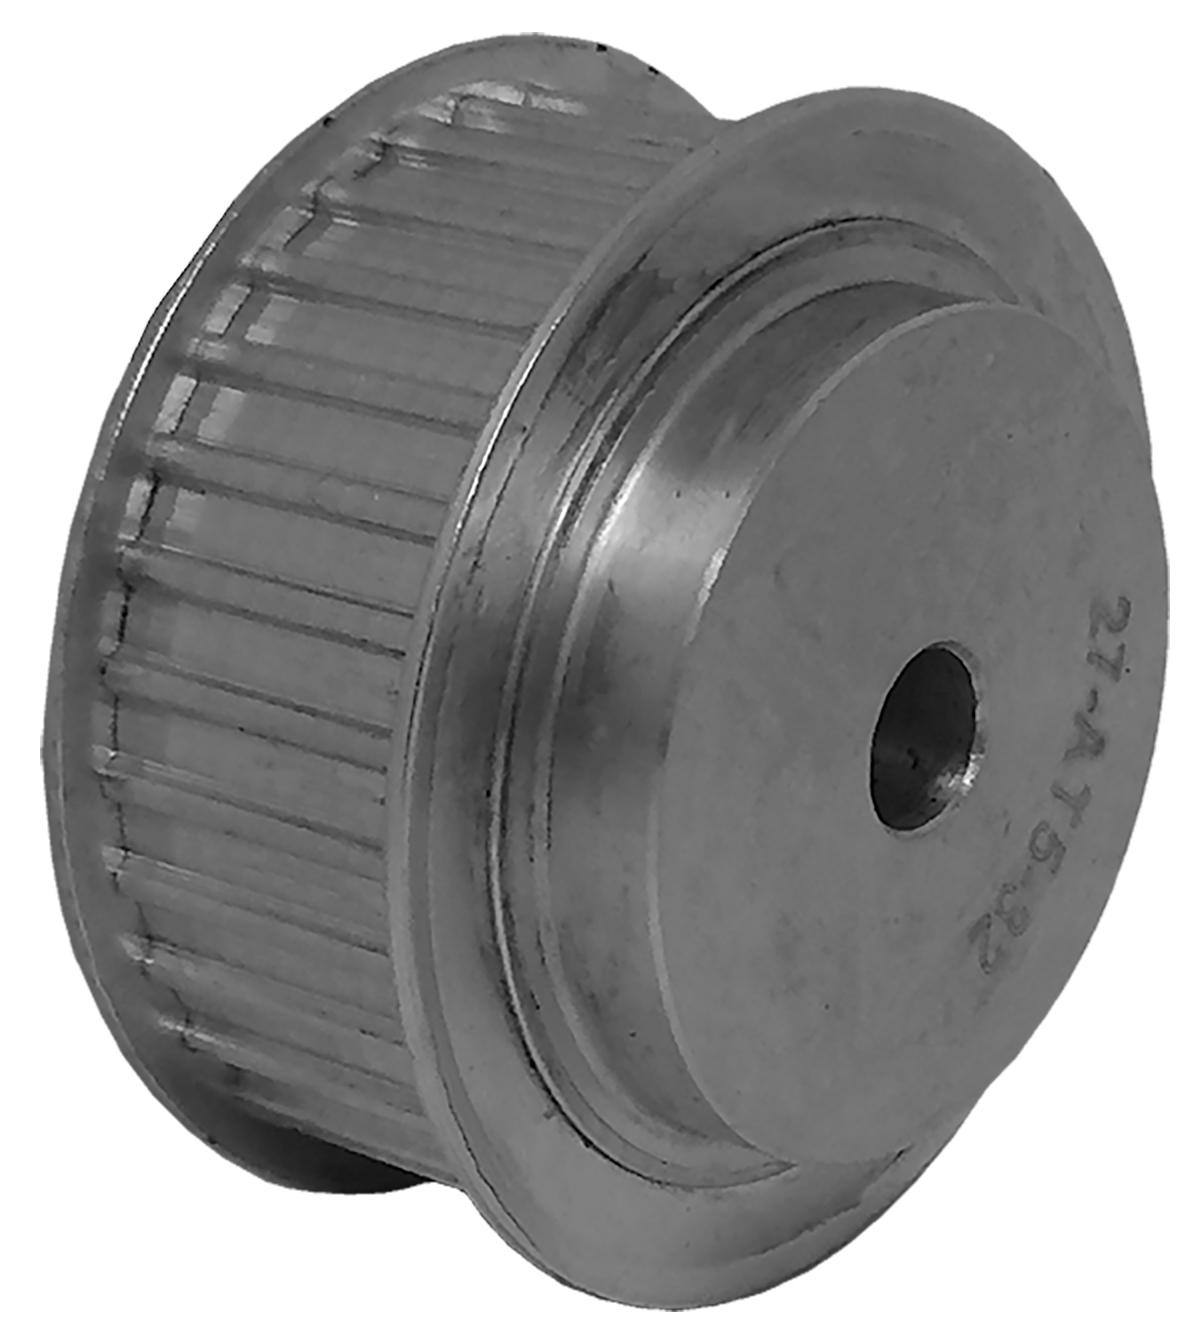 27AT5/32-2 - Aluminum Metric Pulleys